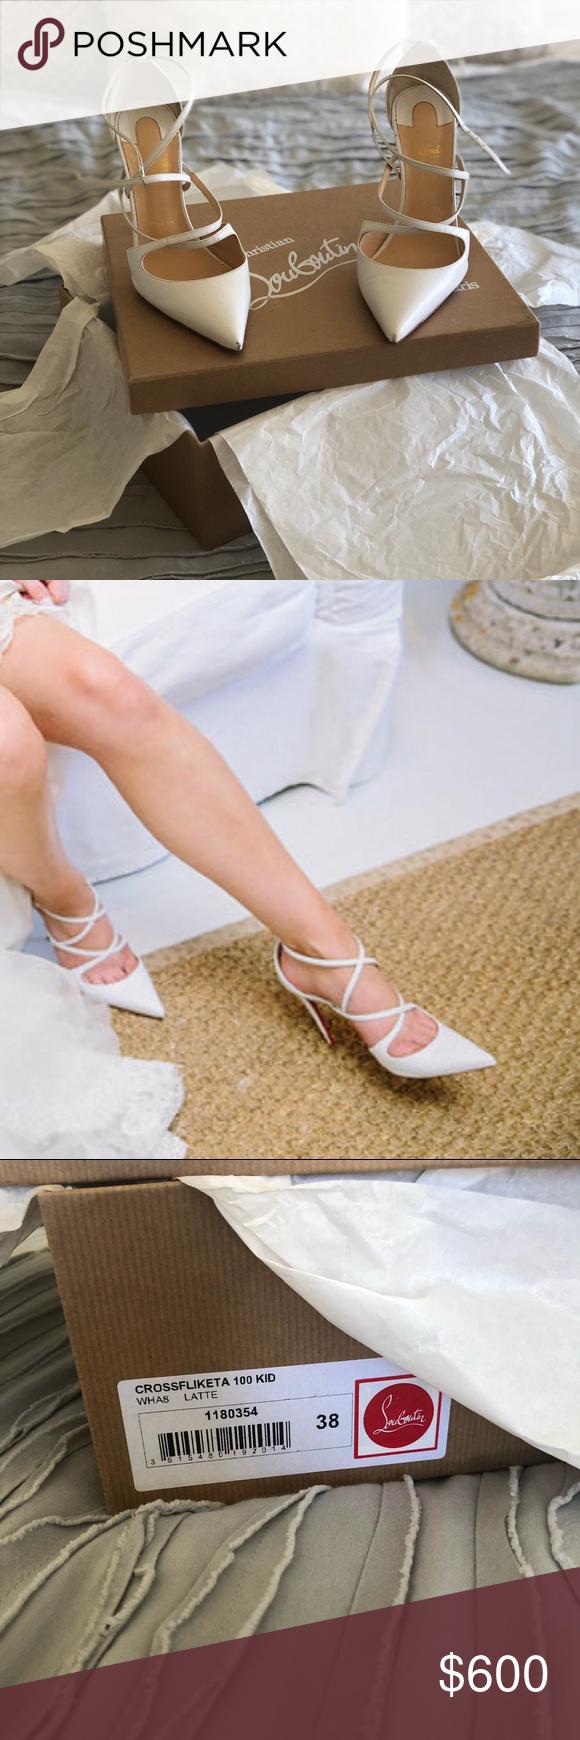 "c829e2d8872e Christian Louboutin Crossfliketa Heels in ""Latte"" Size 38 (US 8) Christian  Louboutin heels in ""Latte"" (white). Worn once on my wedding day"